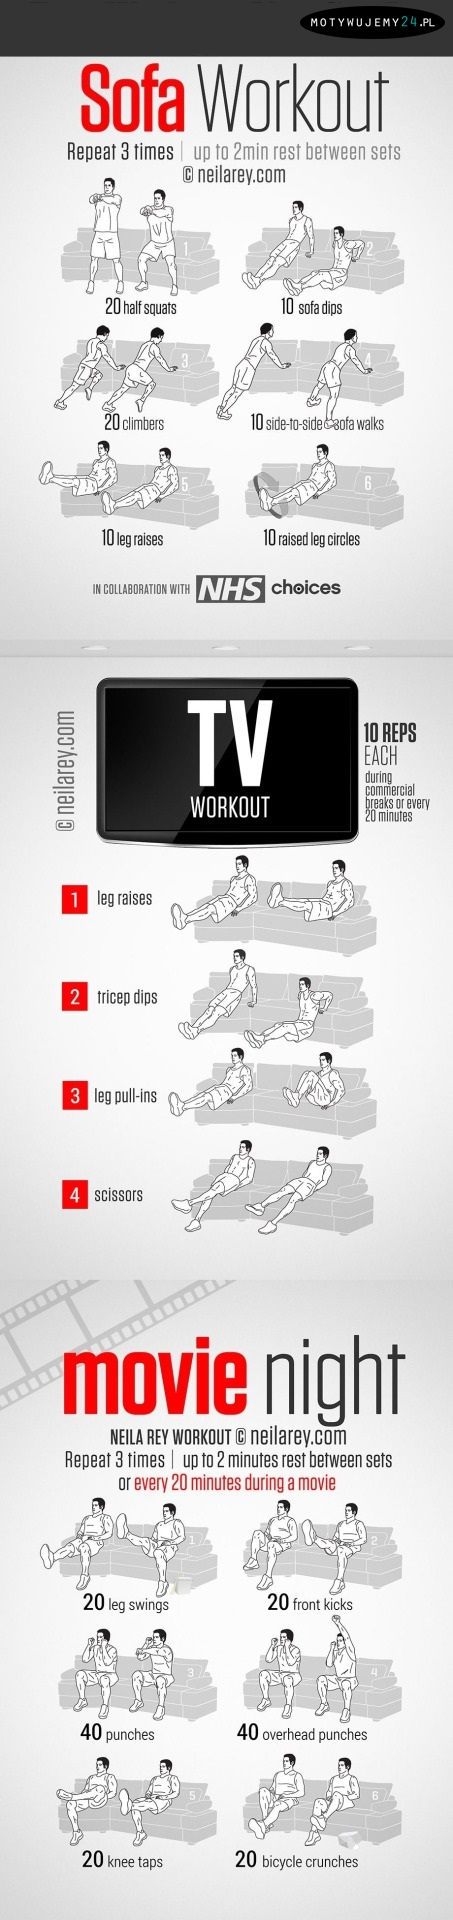 Trening dla leniwych